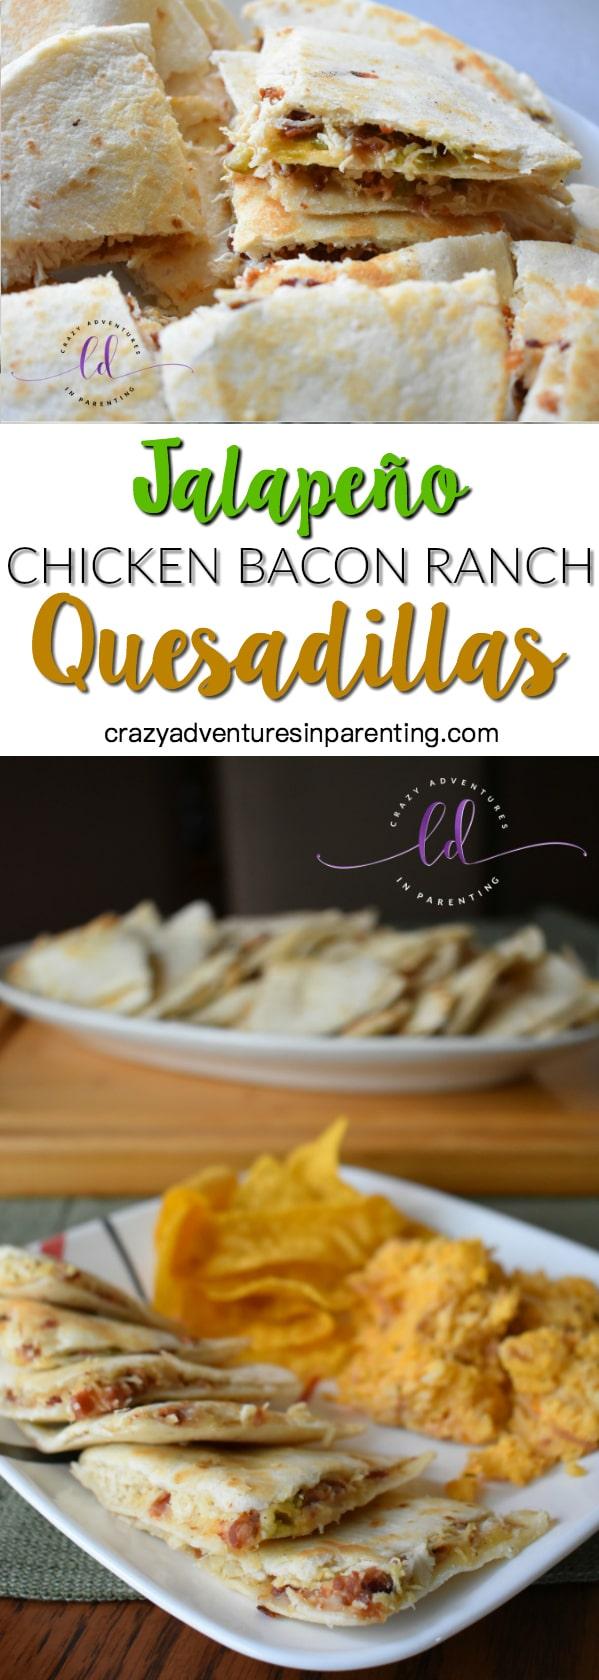 Perfect Jalapeño Chicken Bacon Ranch Quesadillas